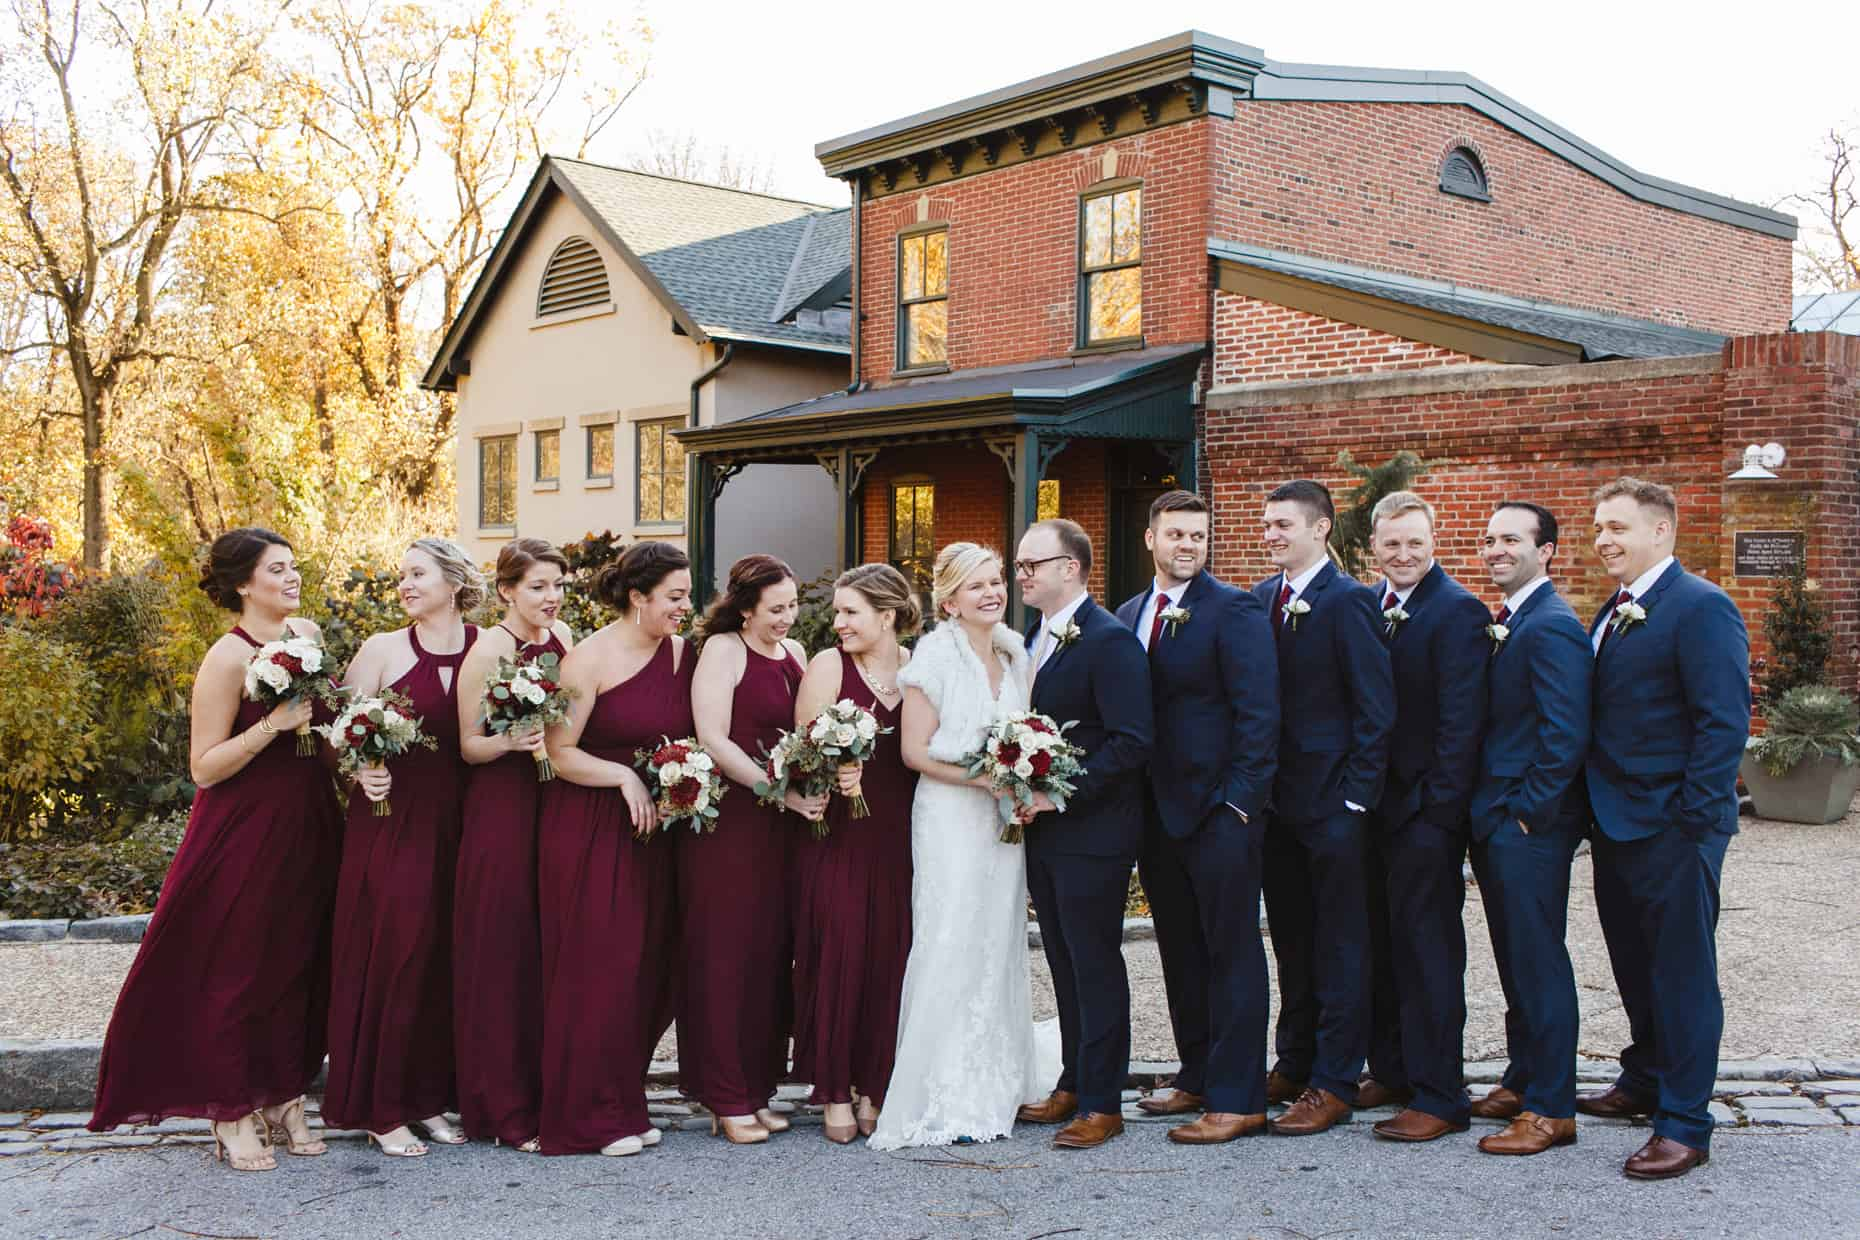 Wedding Photo Delaware Center for Horticulture